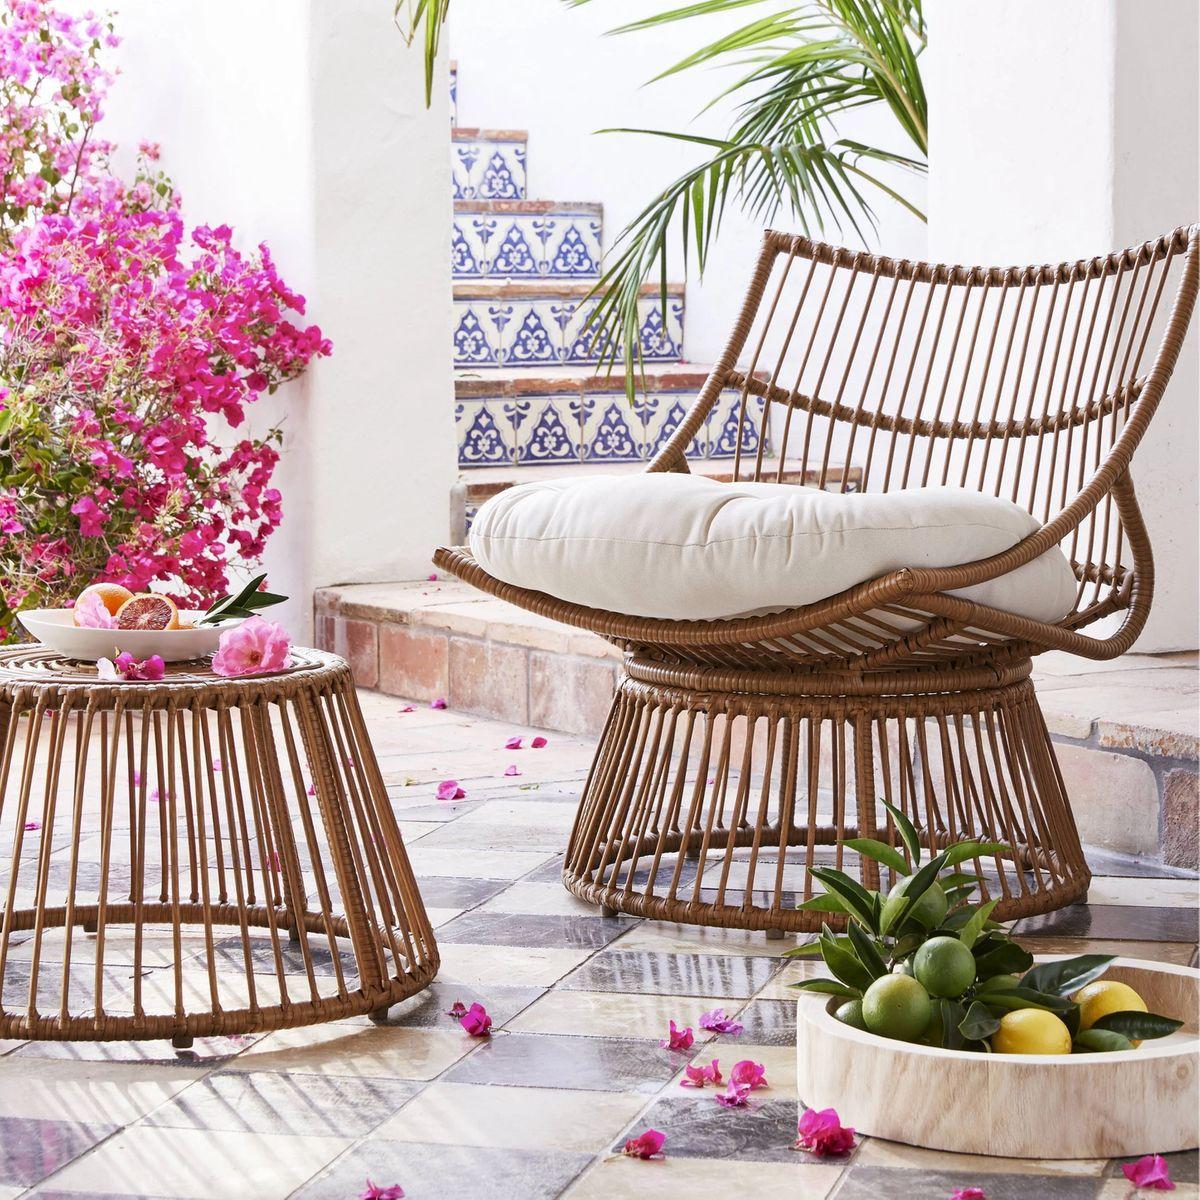 Bowl-shaped chair.